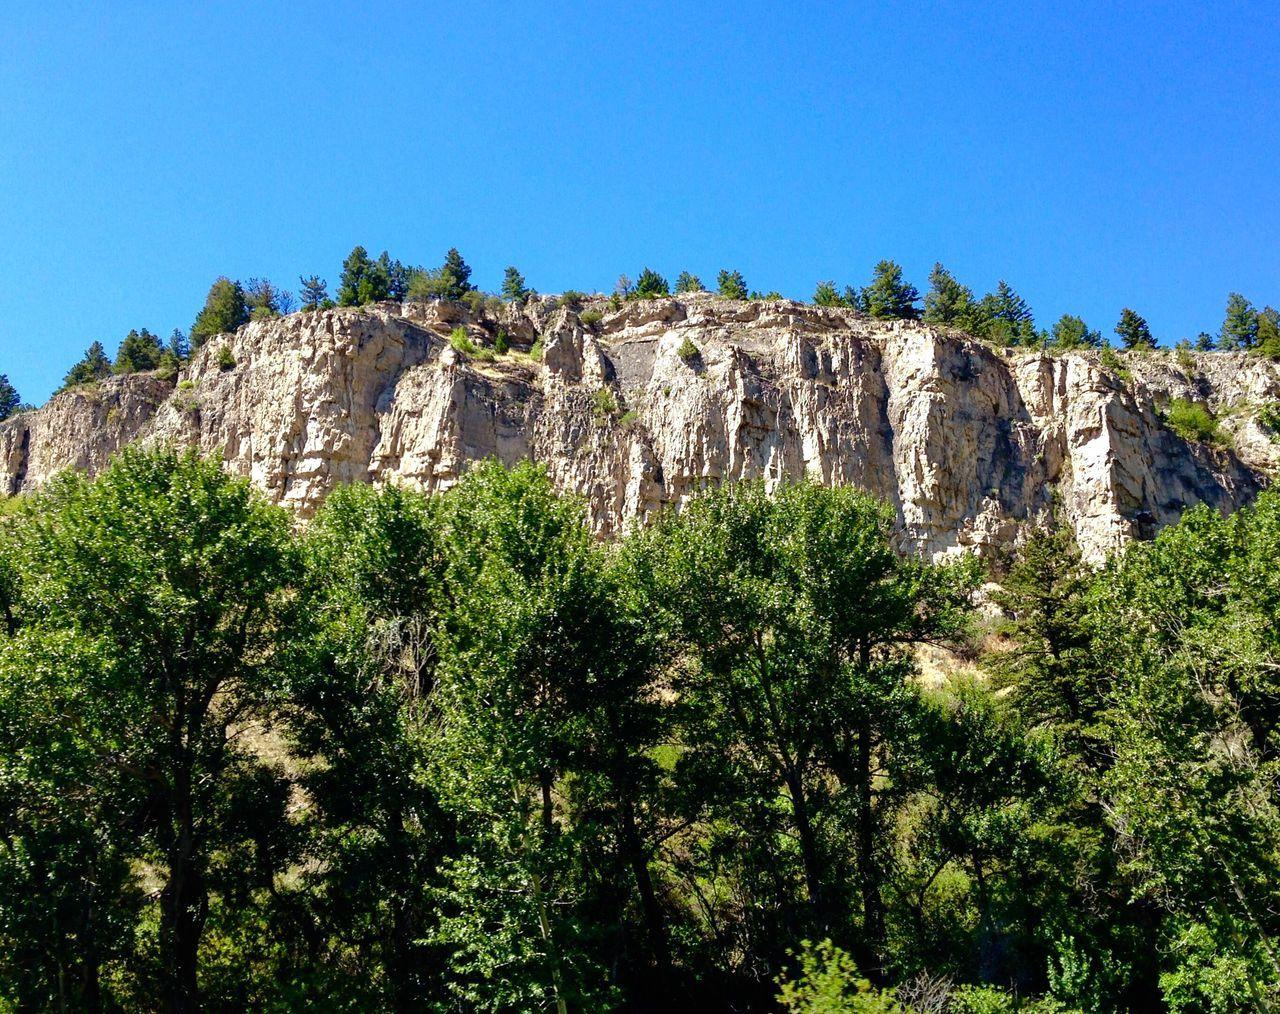 Scenic rocks Scenic Rocks Scenic Drive Road Trip Trees Travel Outdoors Sky Montana